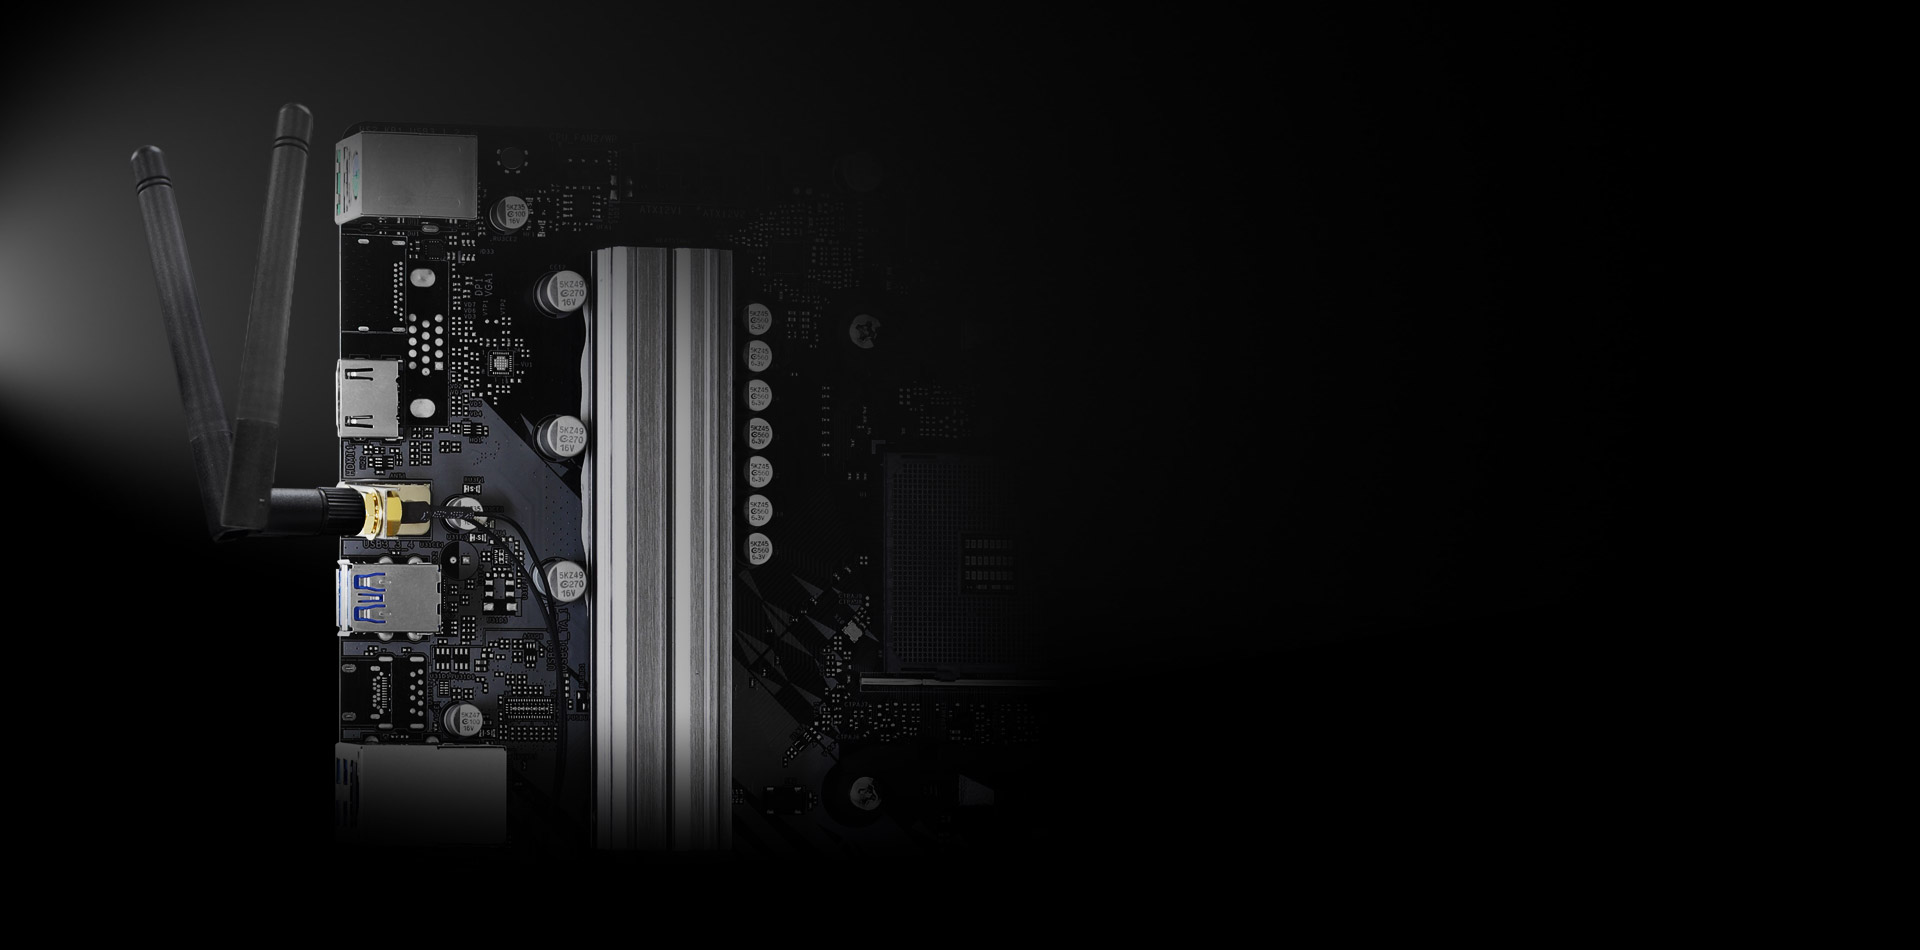 WiFi-IntelDualBand of the motherboard